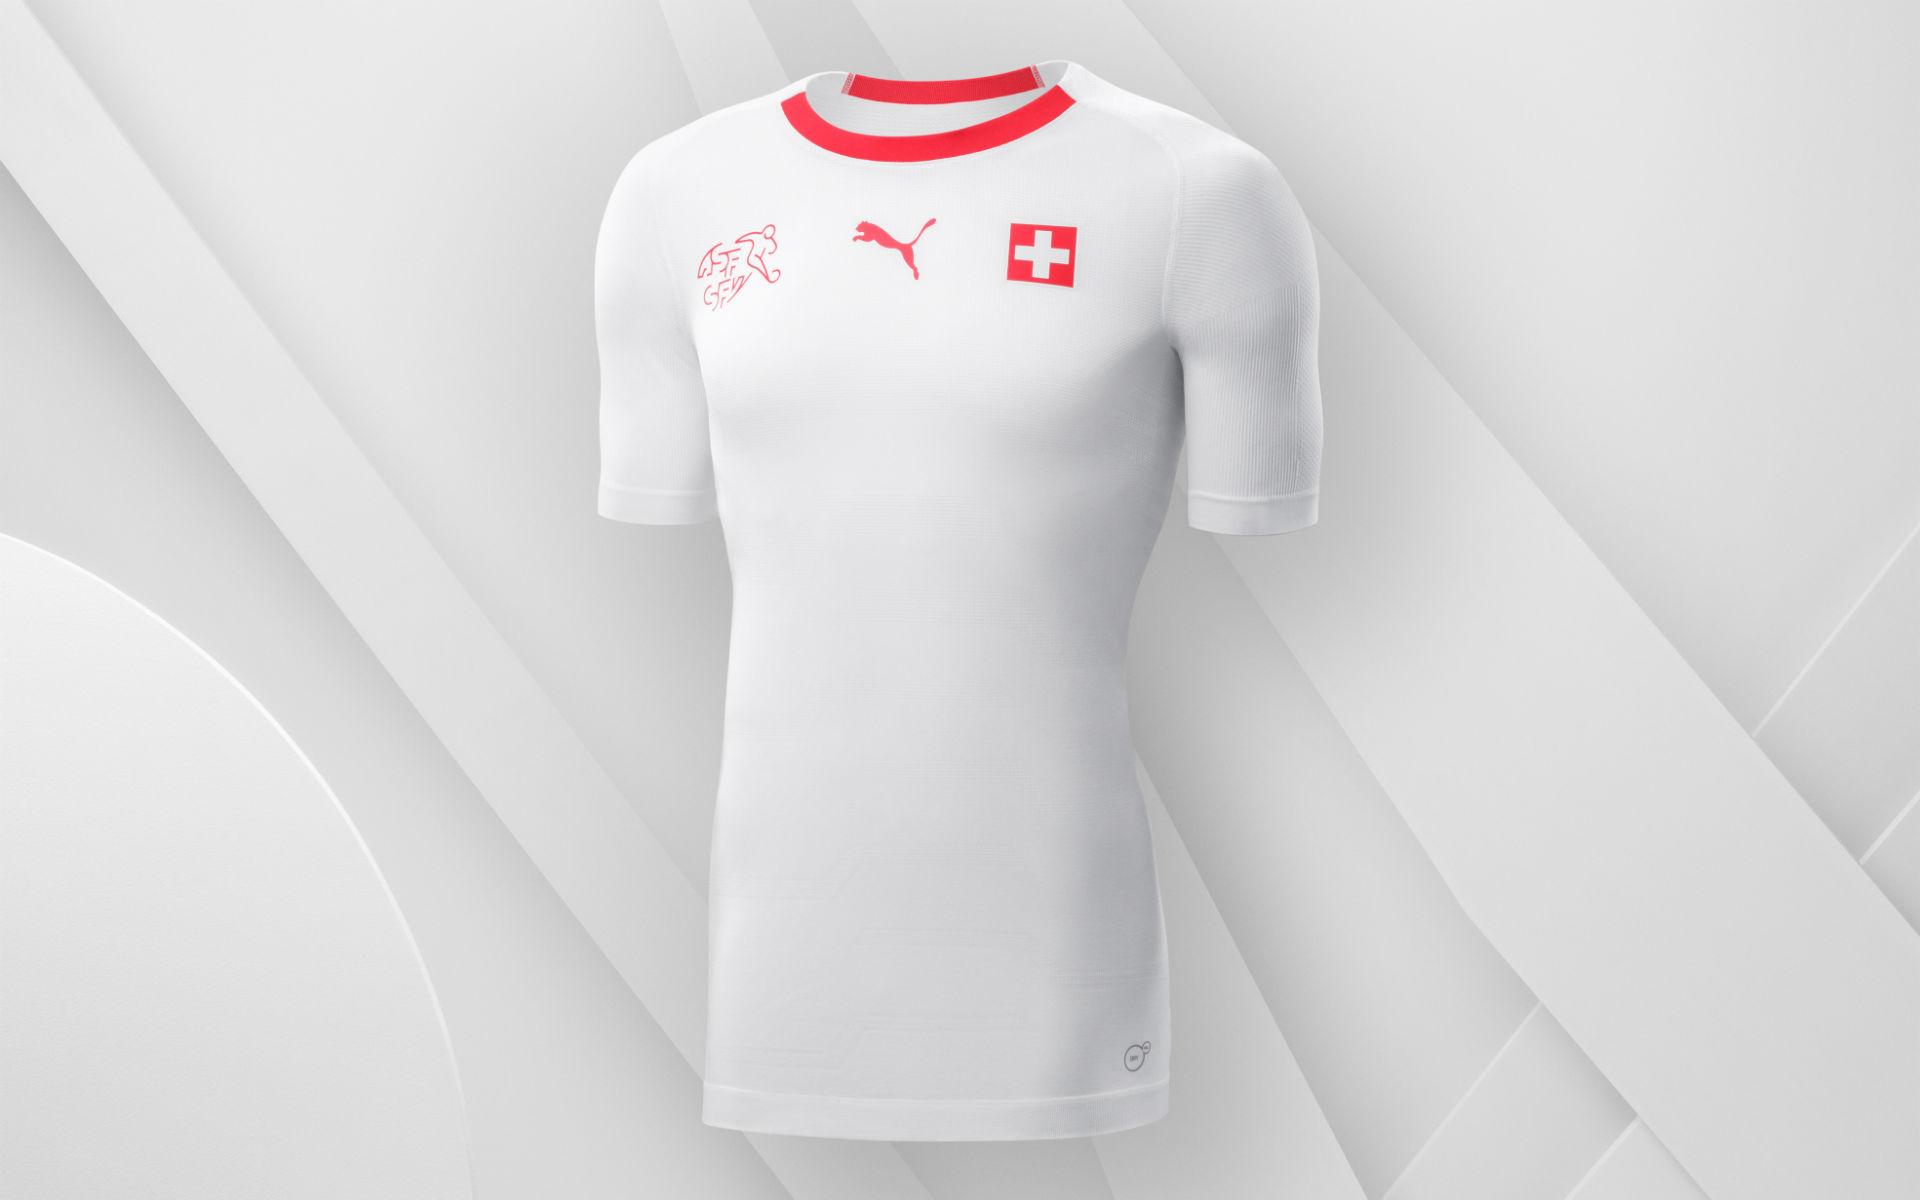 Must see England Jersey World Cup 2018 - switzerland-shirt-wc-puma_1ukr60u1keyi019hi64xq30wo6  HD_607526 .jpg?t\u003d1051854058